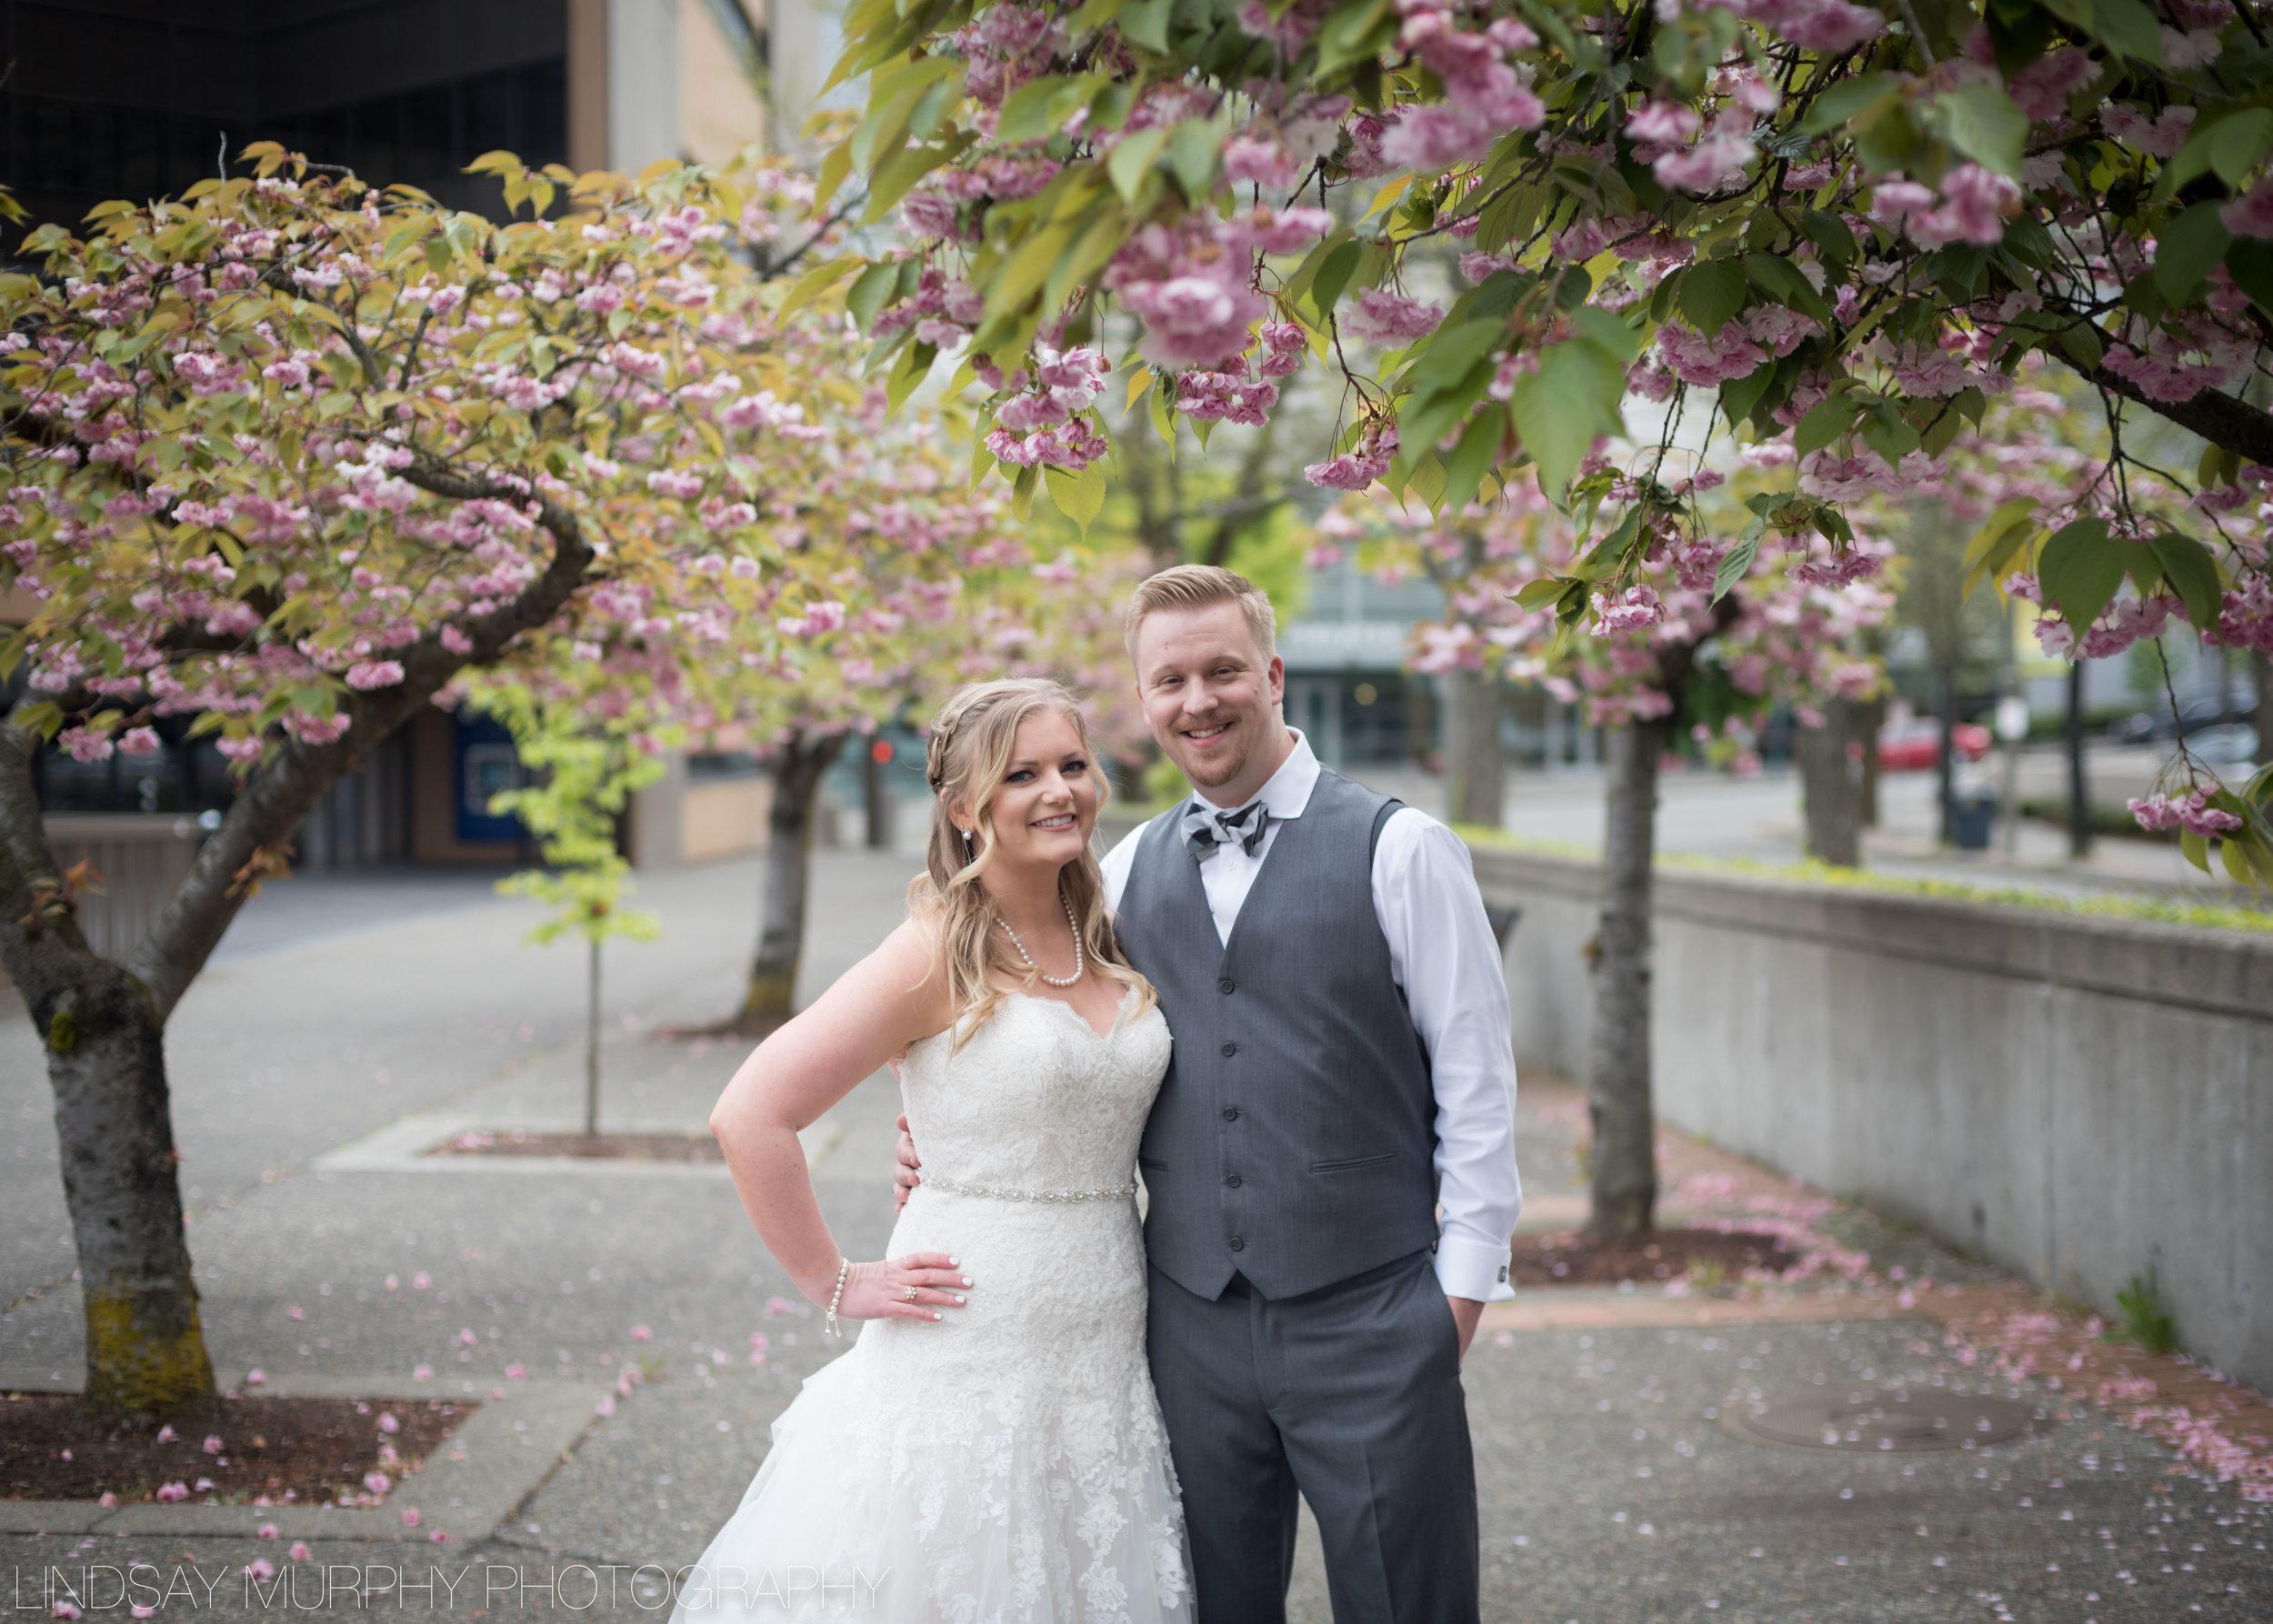 Tacoma_Wedding_photography-39.jpg